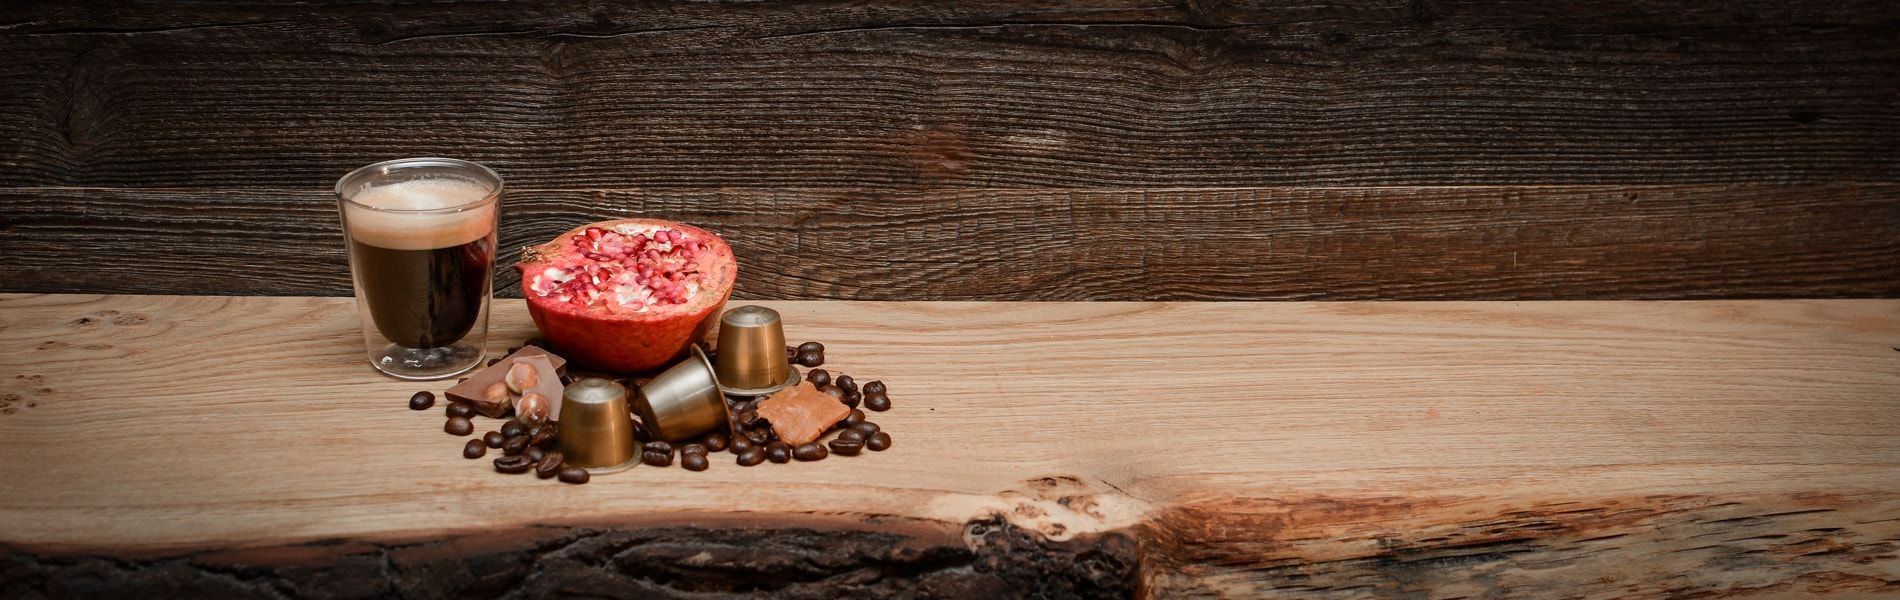 Honduras organic coffee capsules | Jones Brothers Coffee